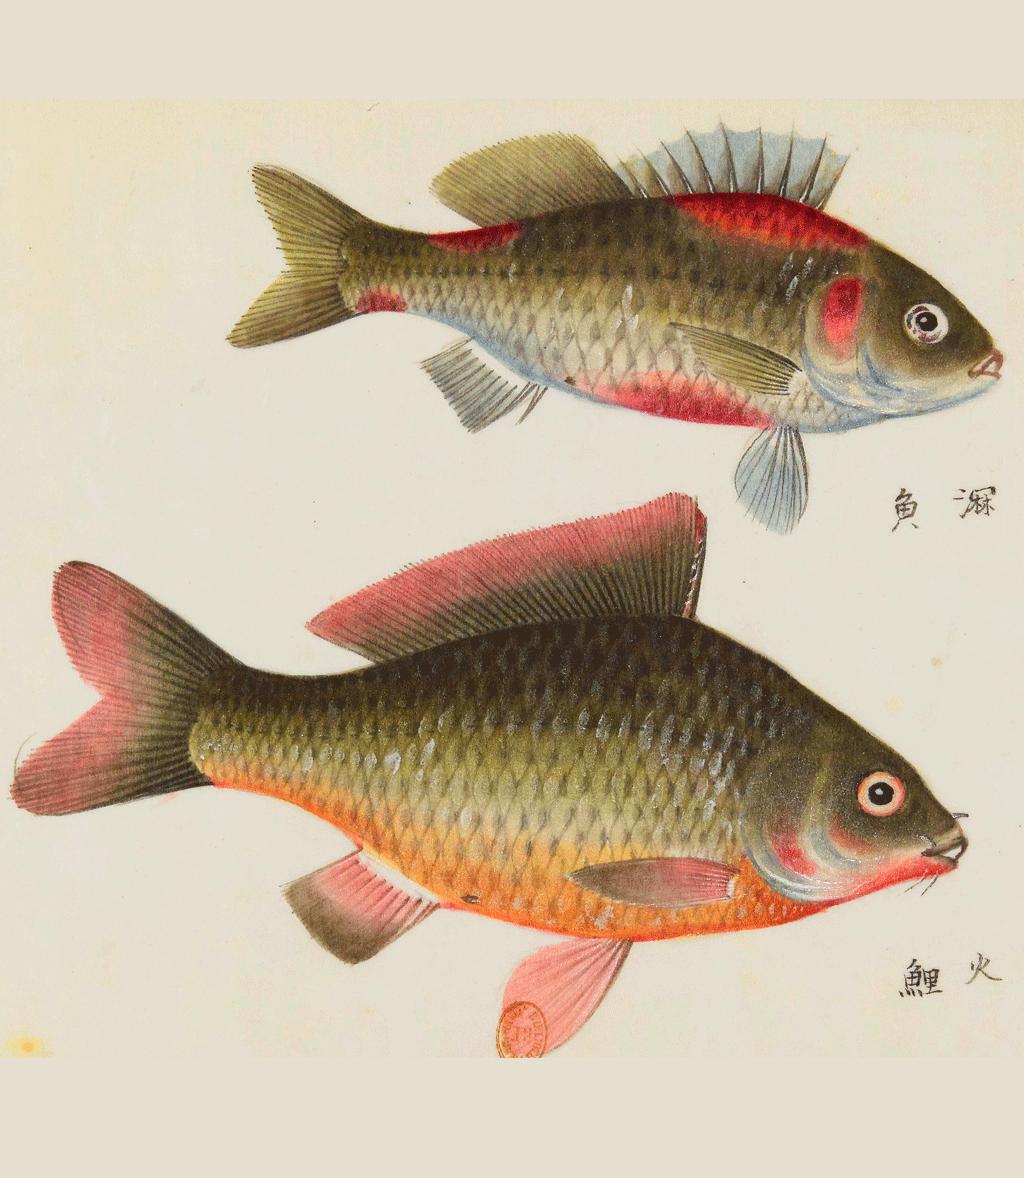 Aller poissons datation recherche